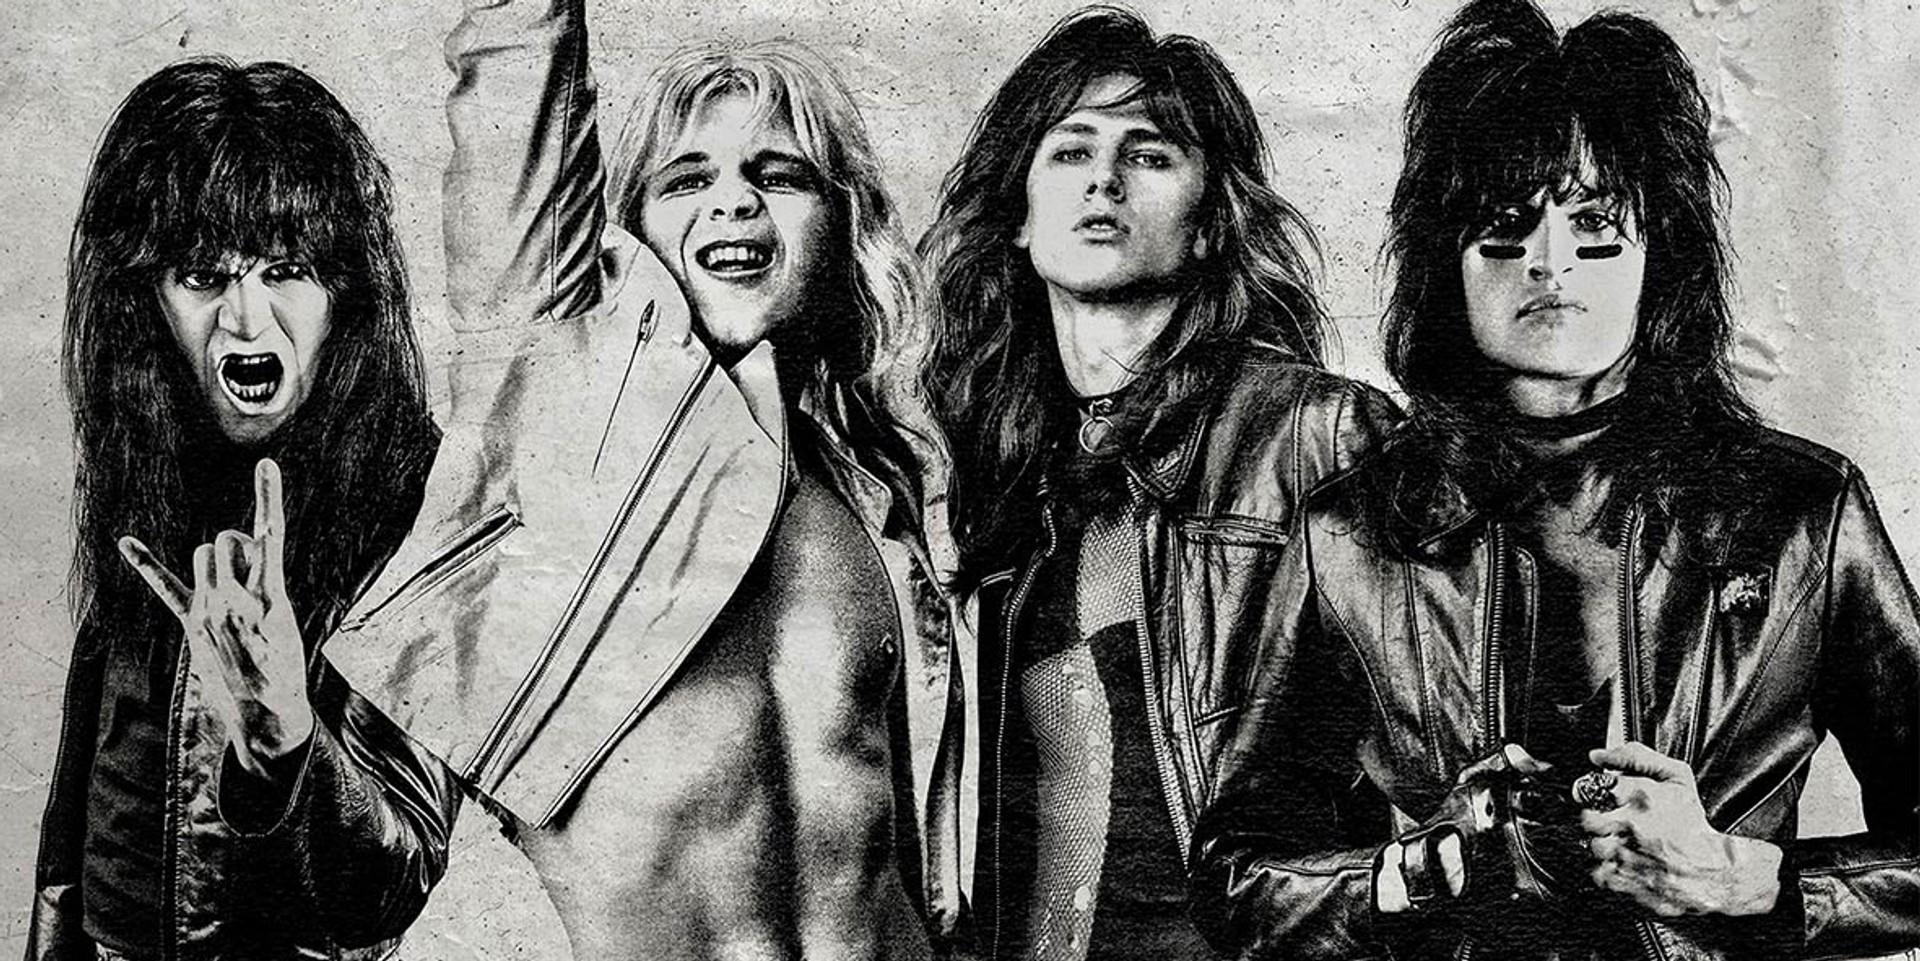 The first trailer for Machine Gun Kelly's Mötely Crüe movie is here – watch